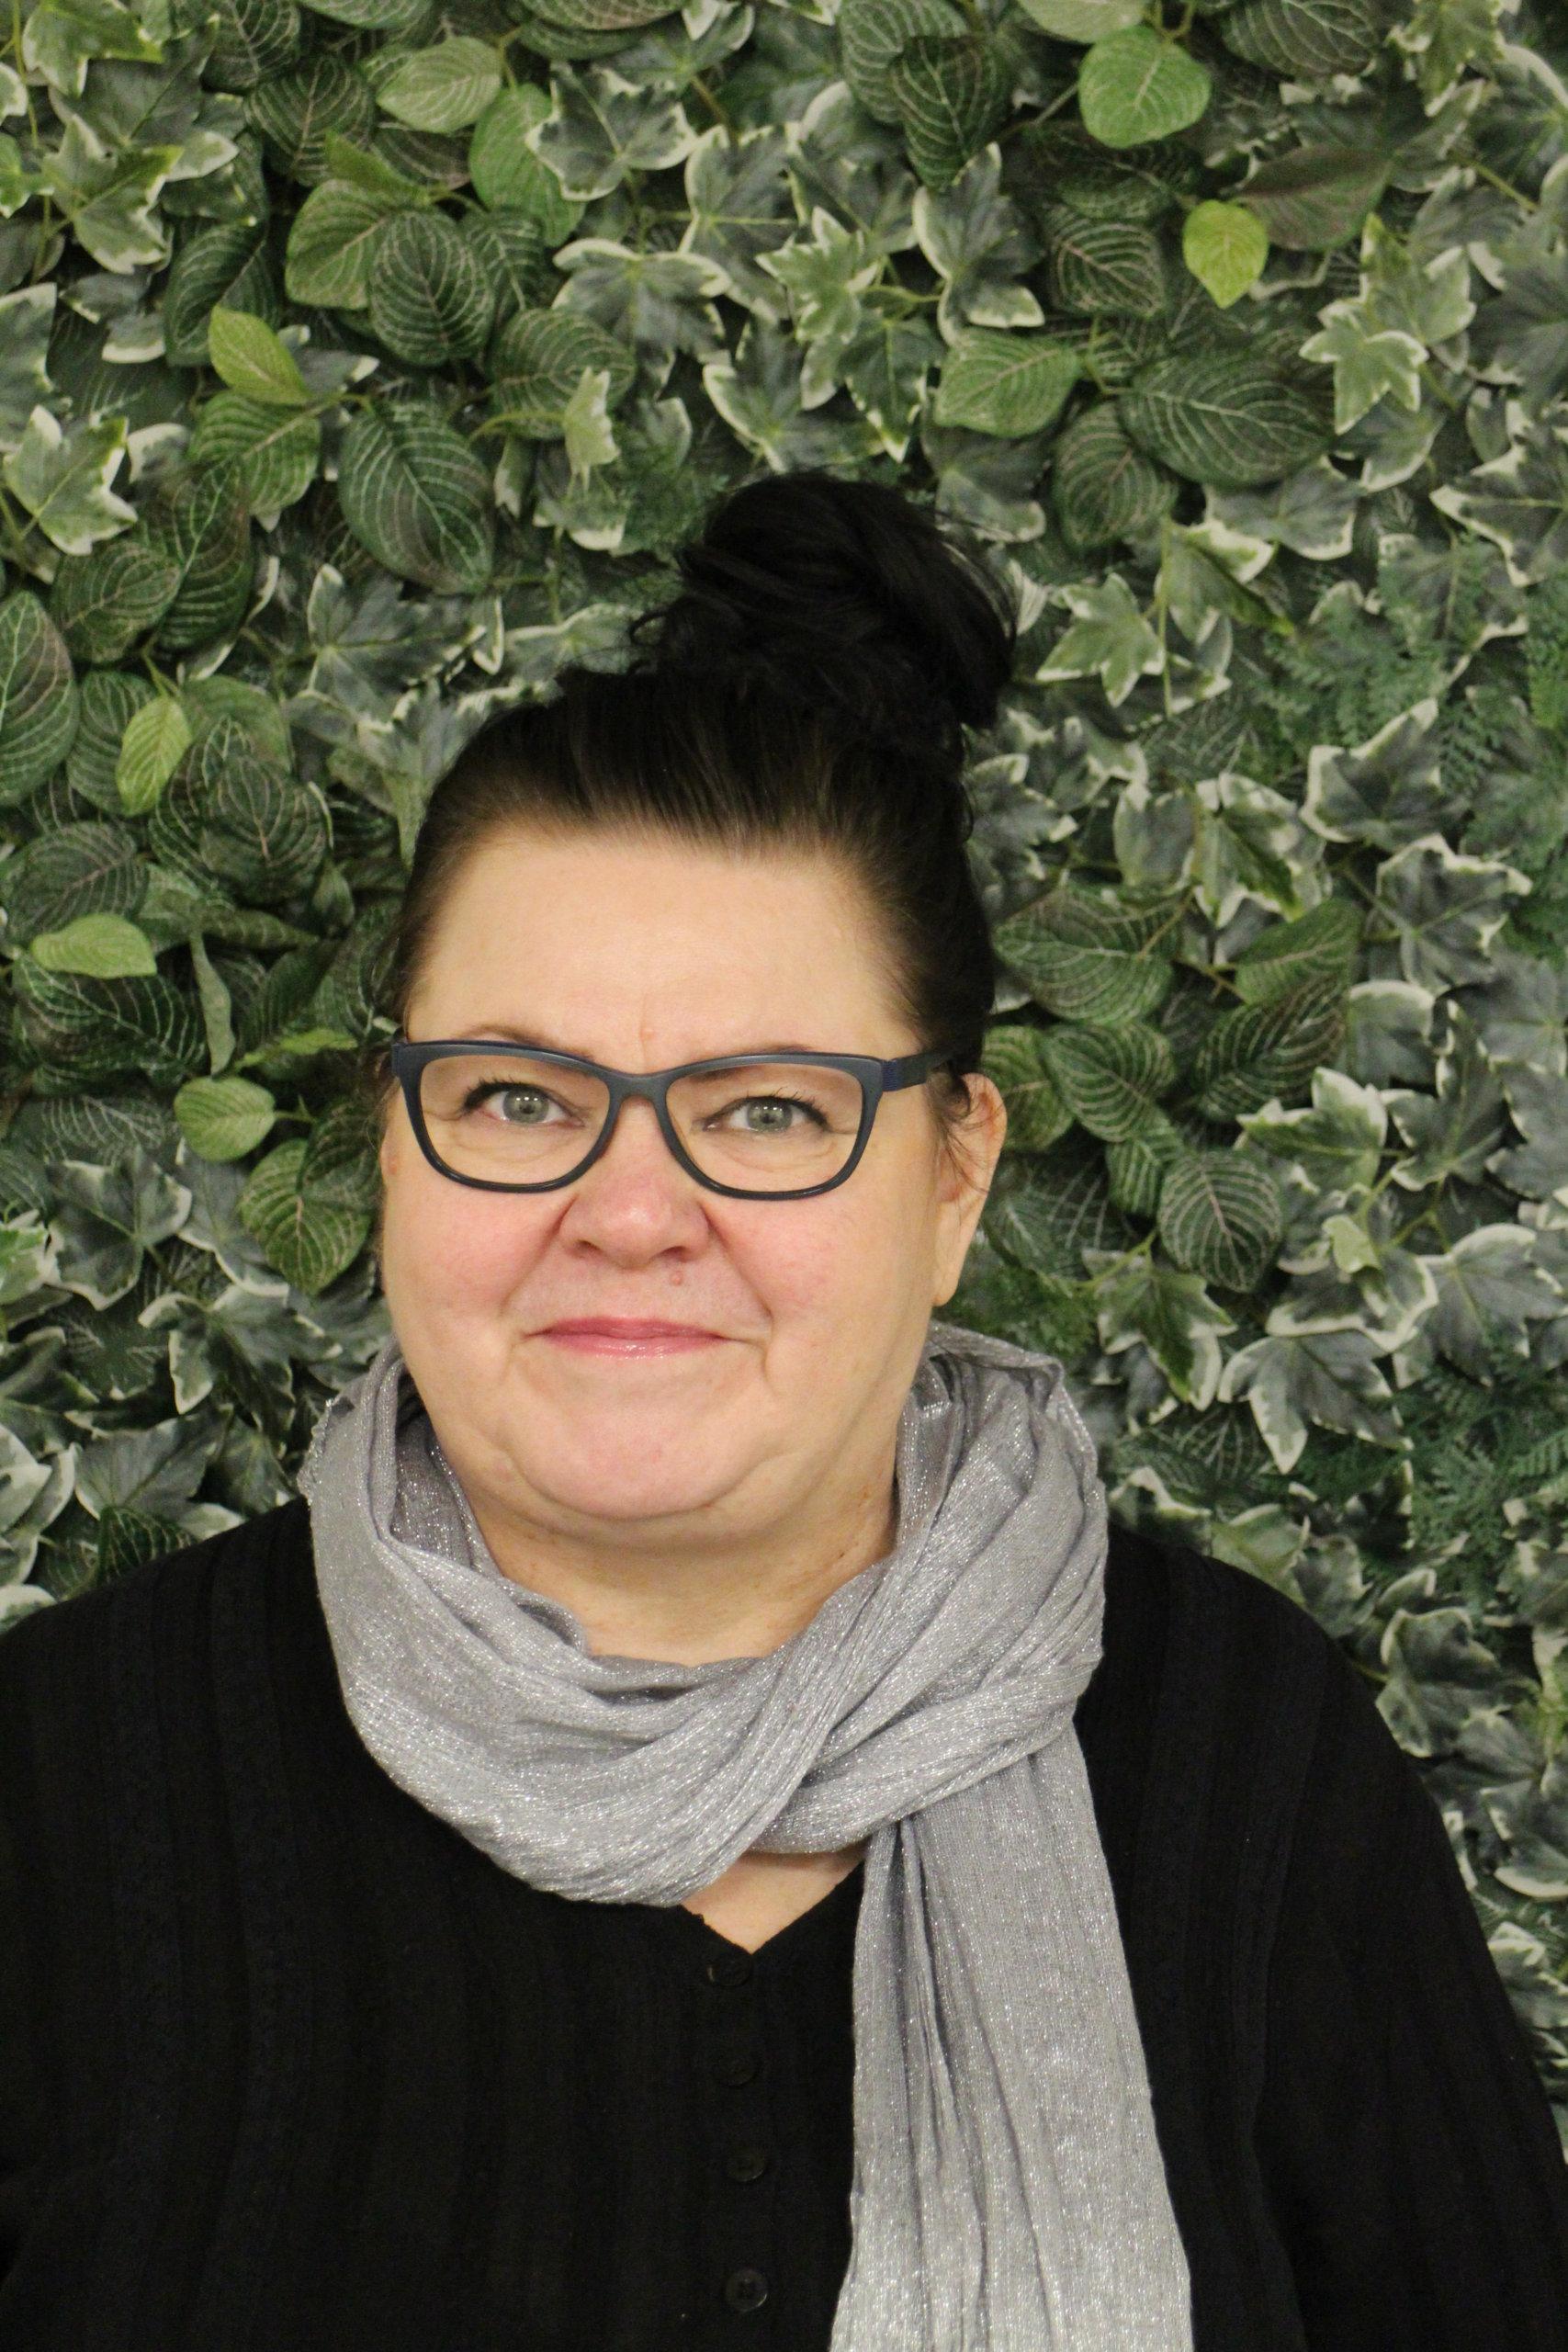 Katja Igbineweka